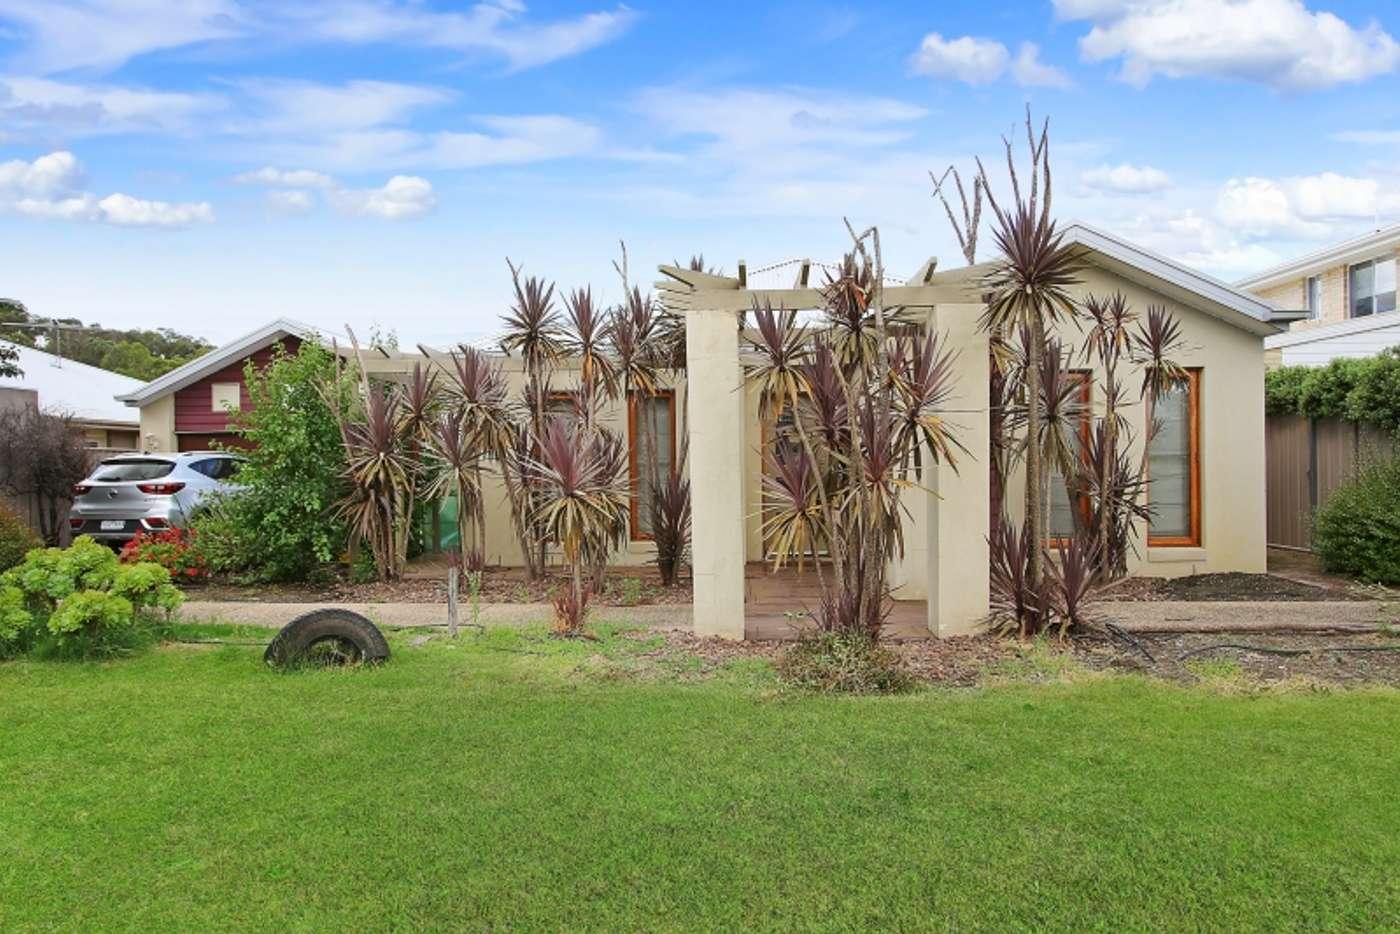 Main view of Homely house listing, 94 YARRALUMLA DRIVE, Wodonga VIC 3690